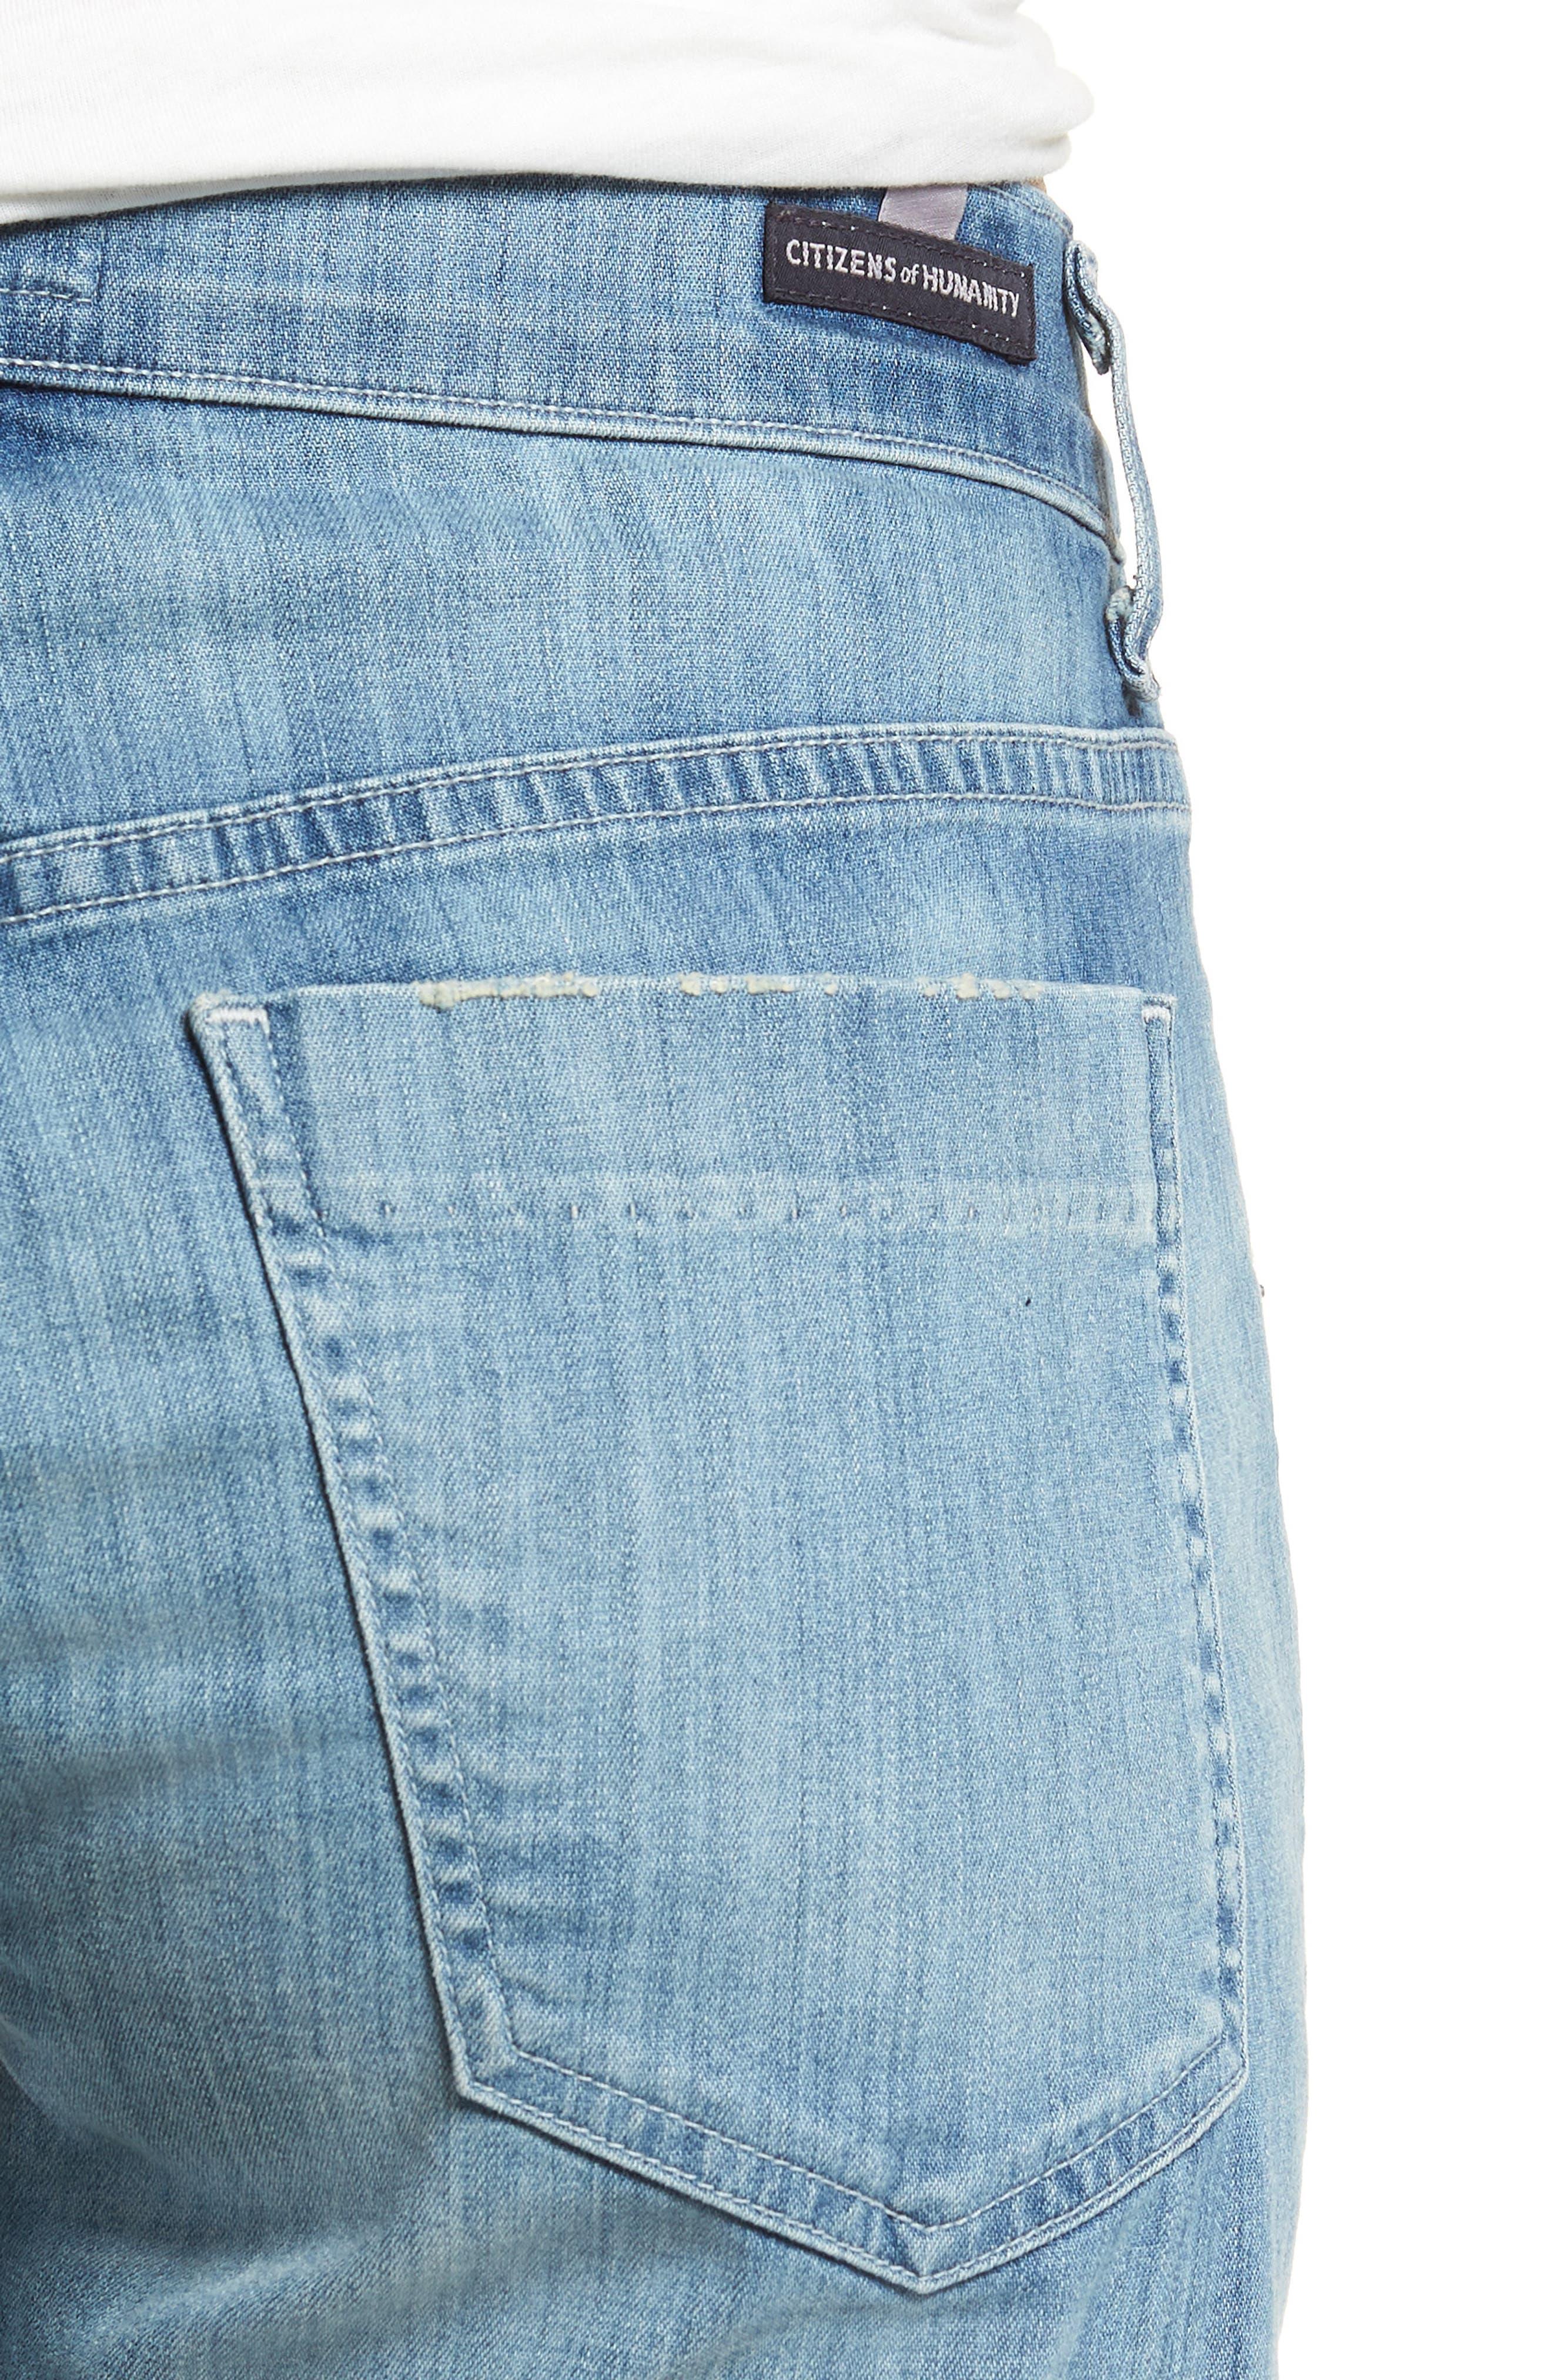 Skyler Denim Shorts,                             Alternate thumbnail 4, color,                             Mercury